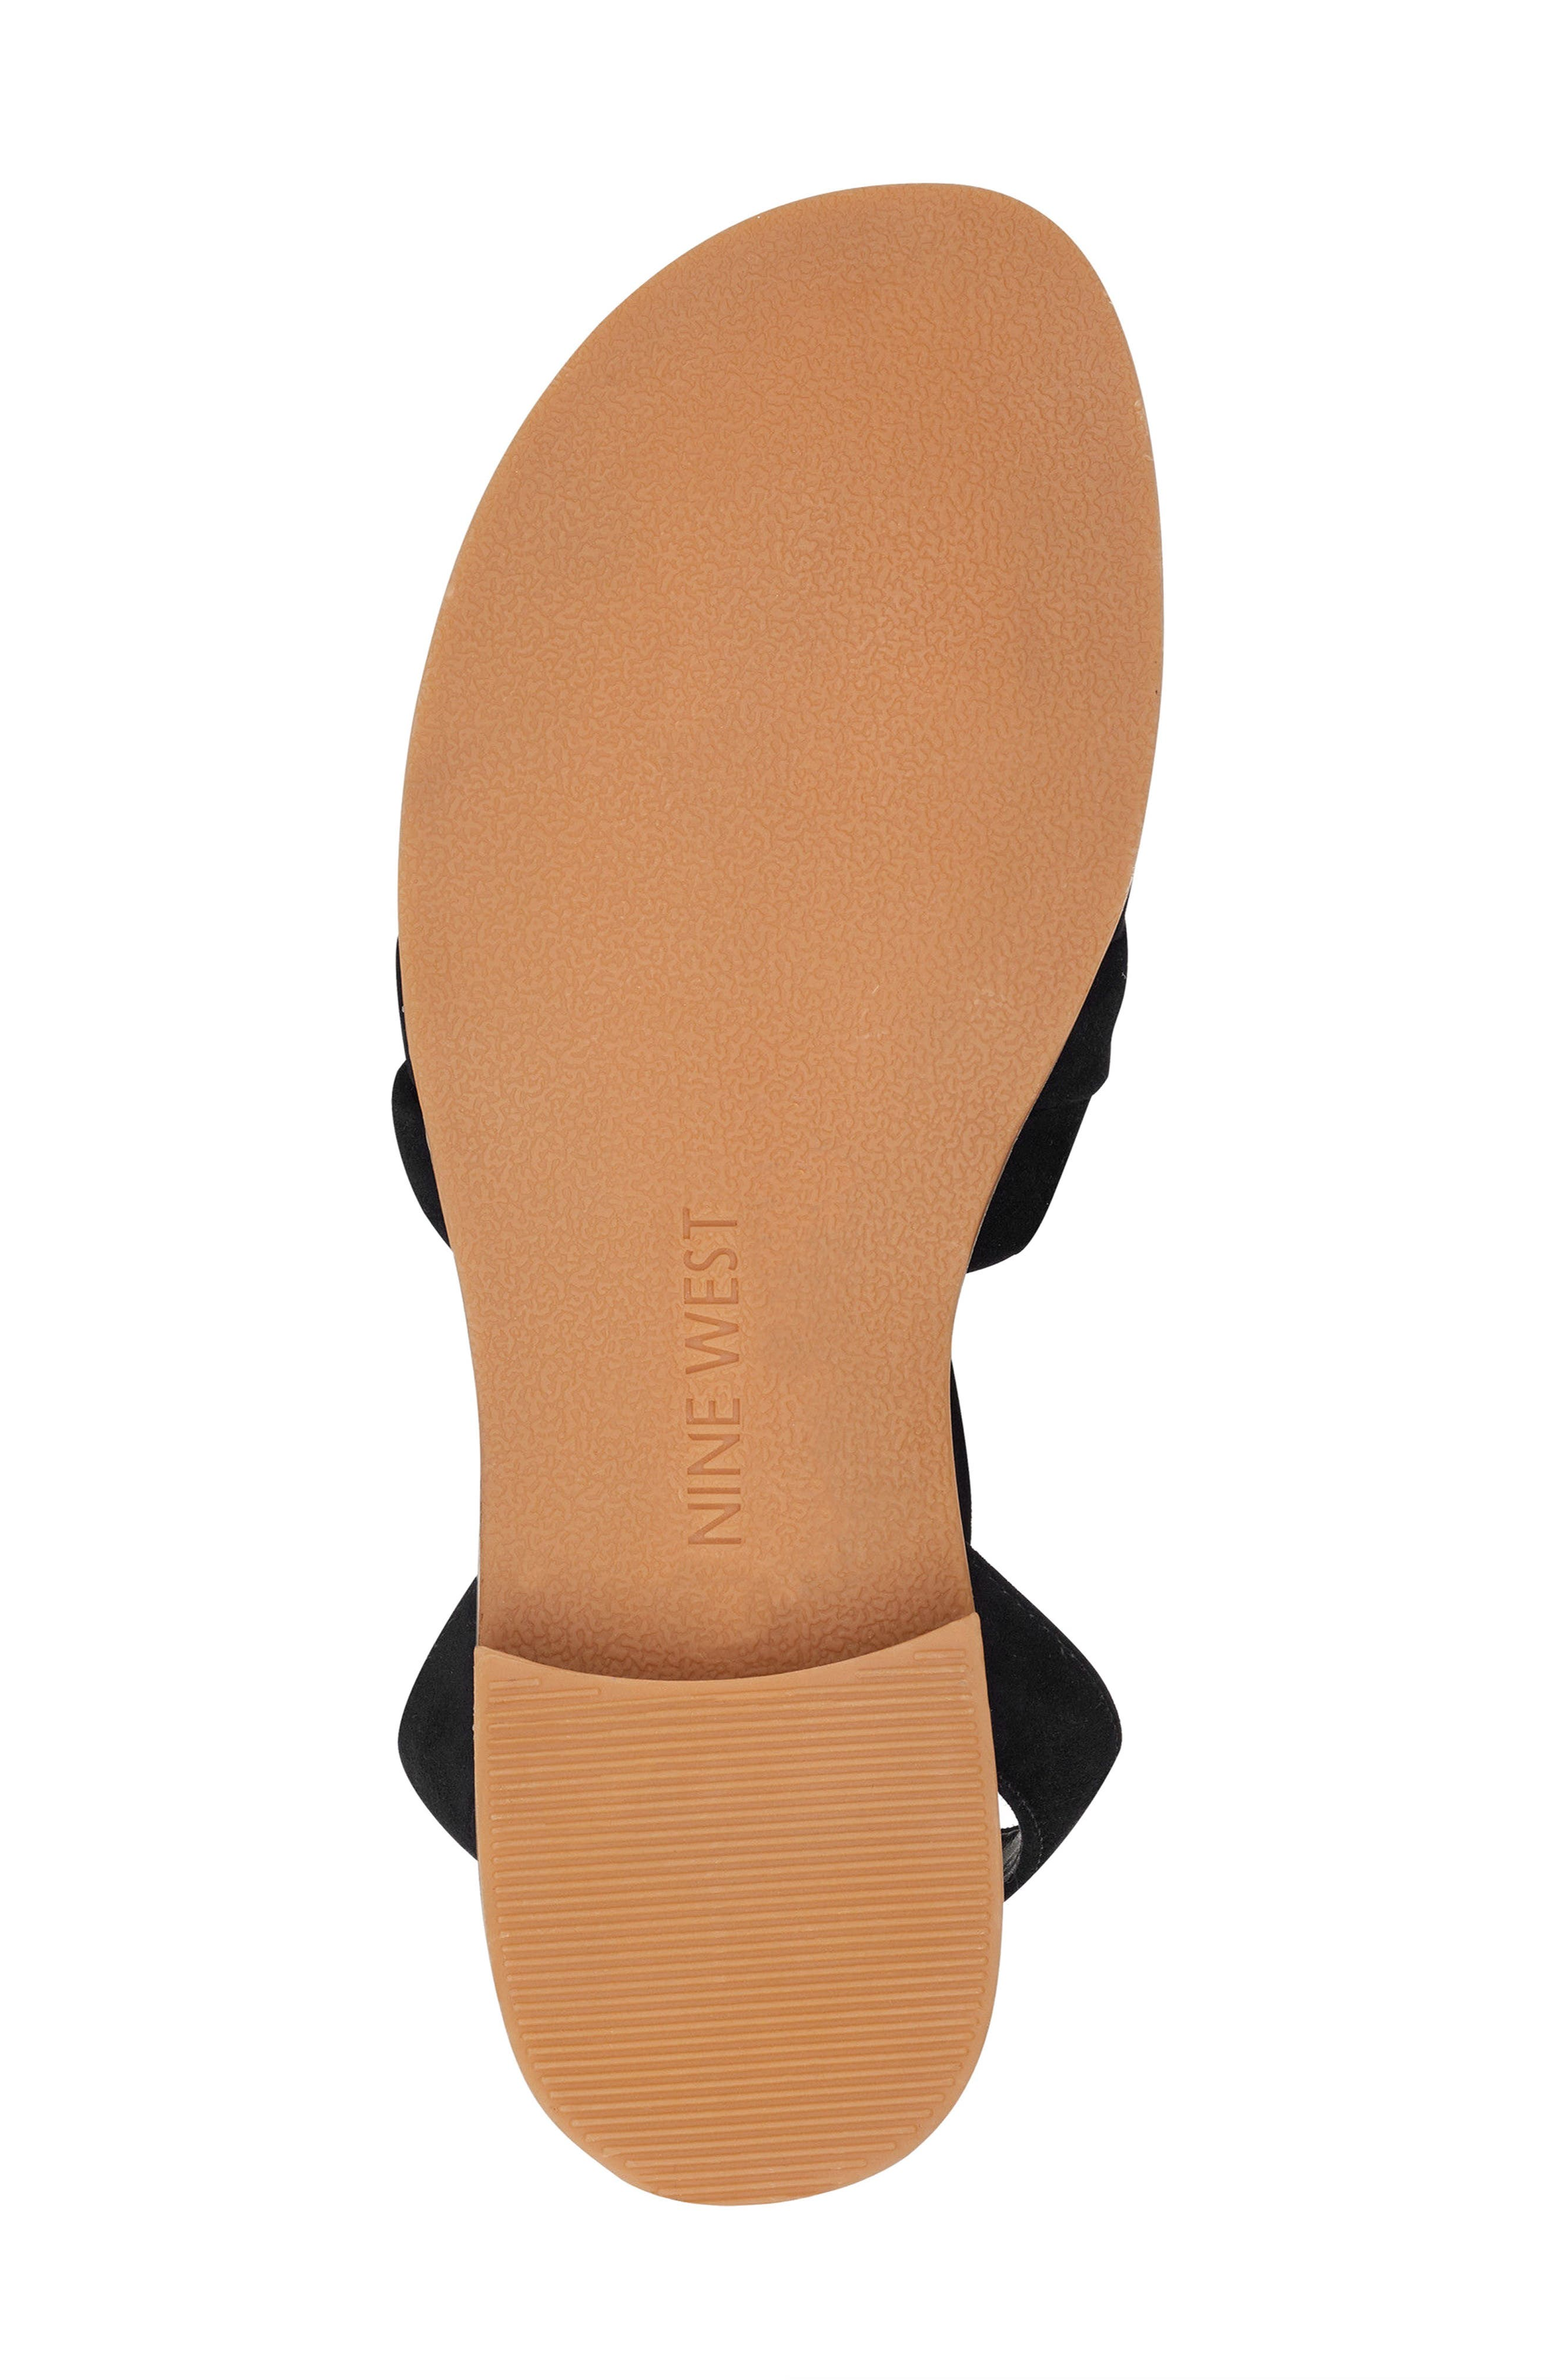 Xameera Knotted Sandal,                             Alternate thumbnail 6, color,                             002